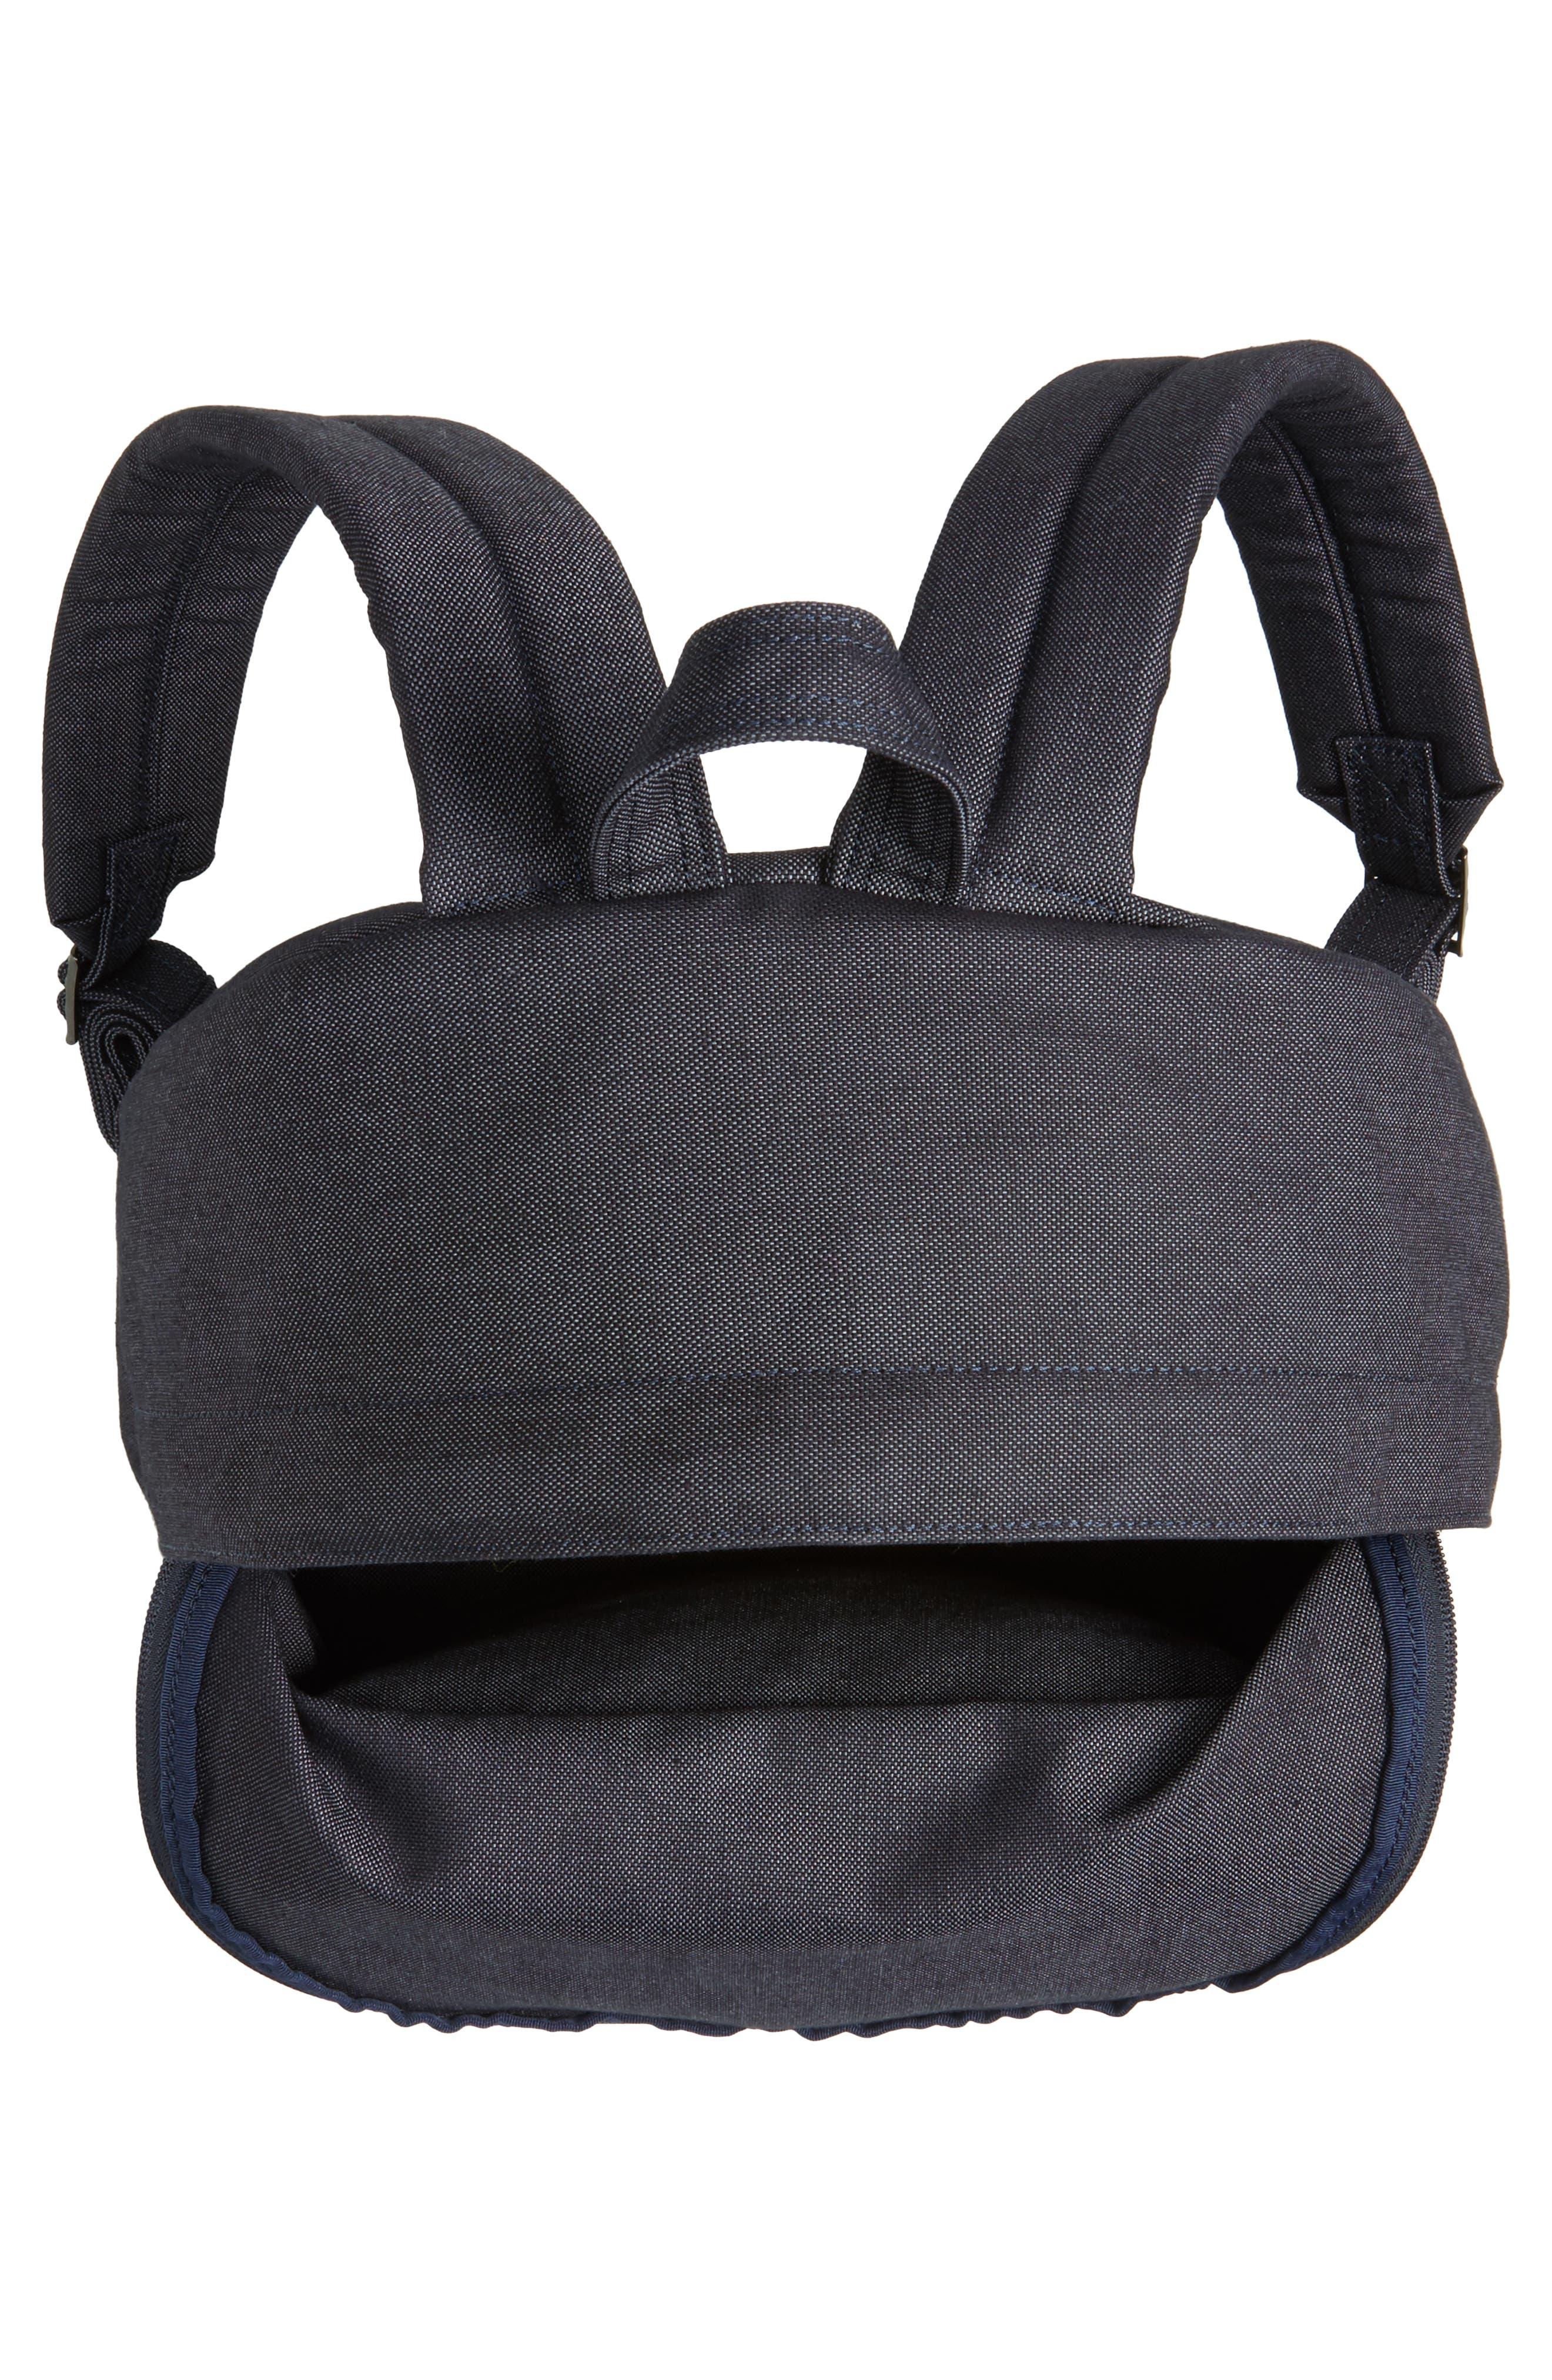 Alternate Image 4  - Porter-Yoshida & Co. Smoky Backpack